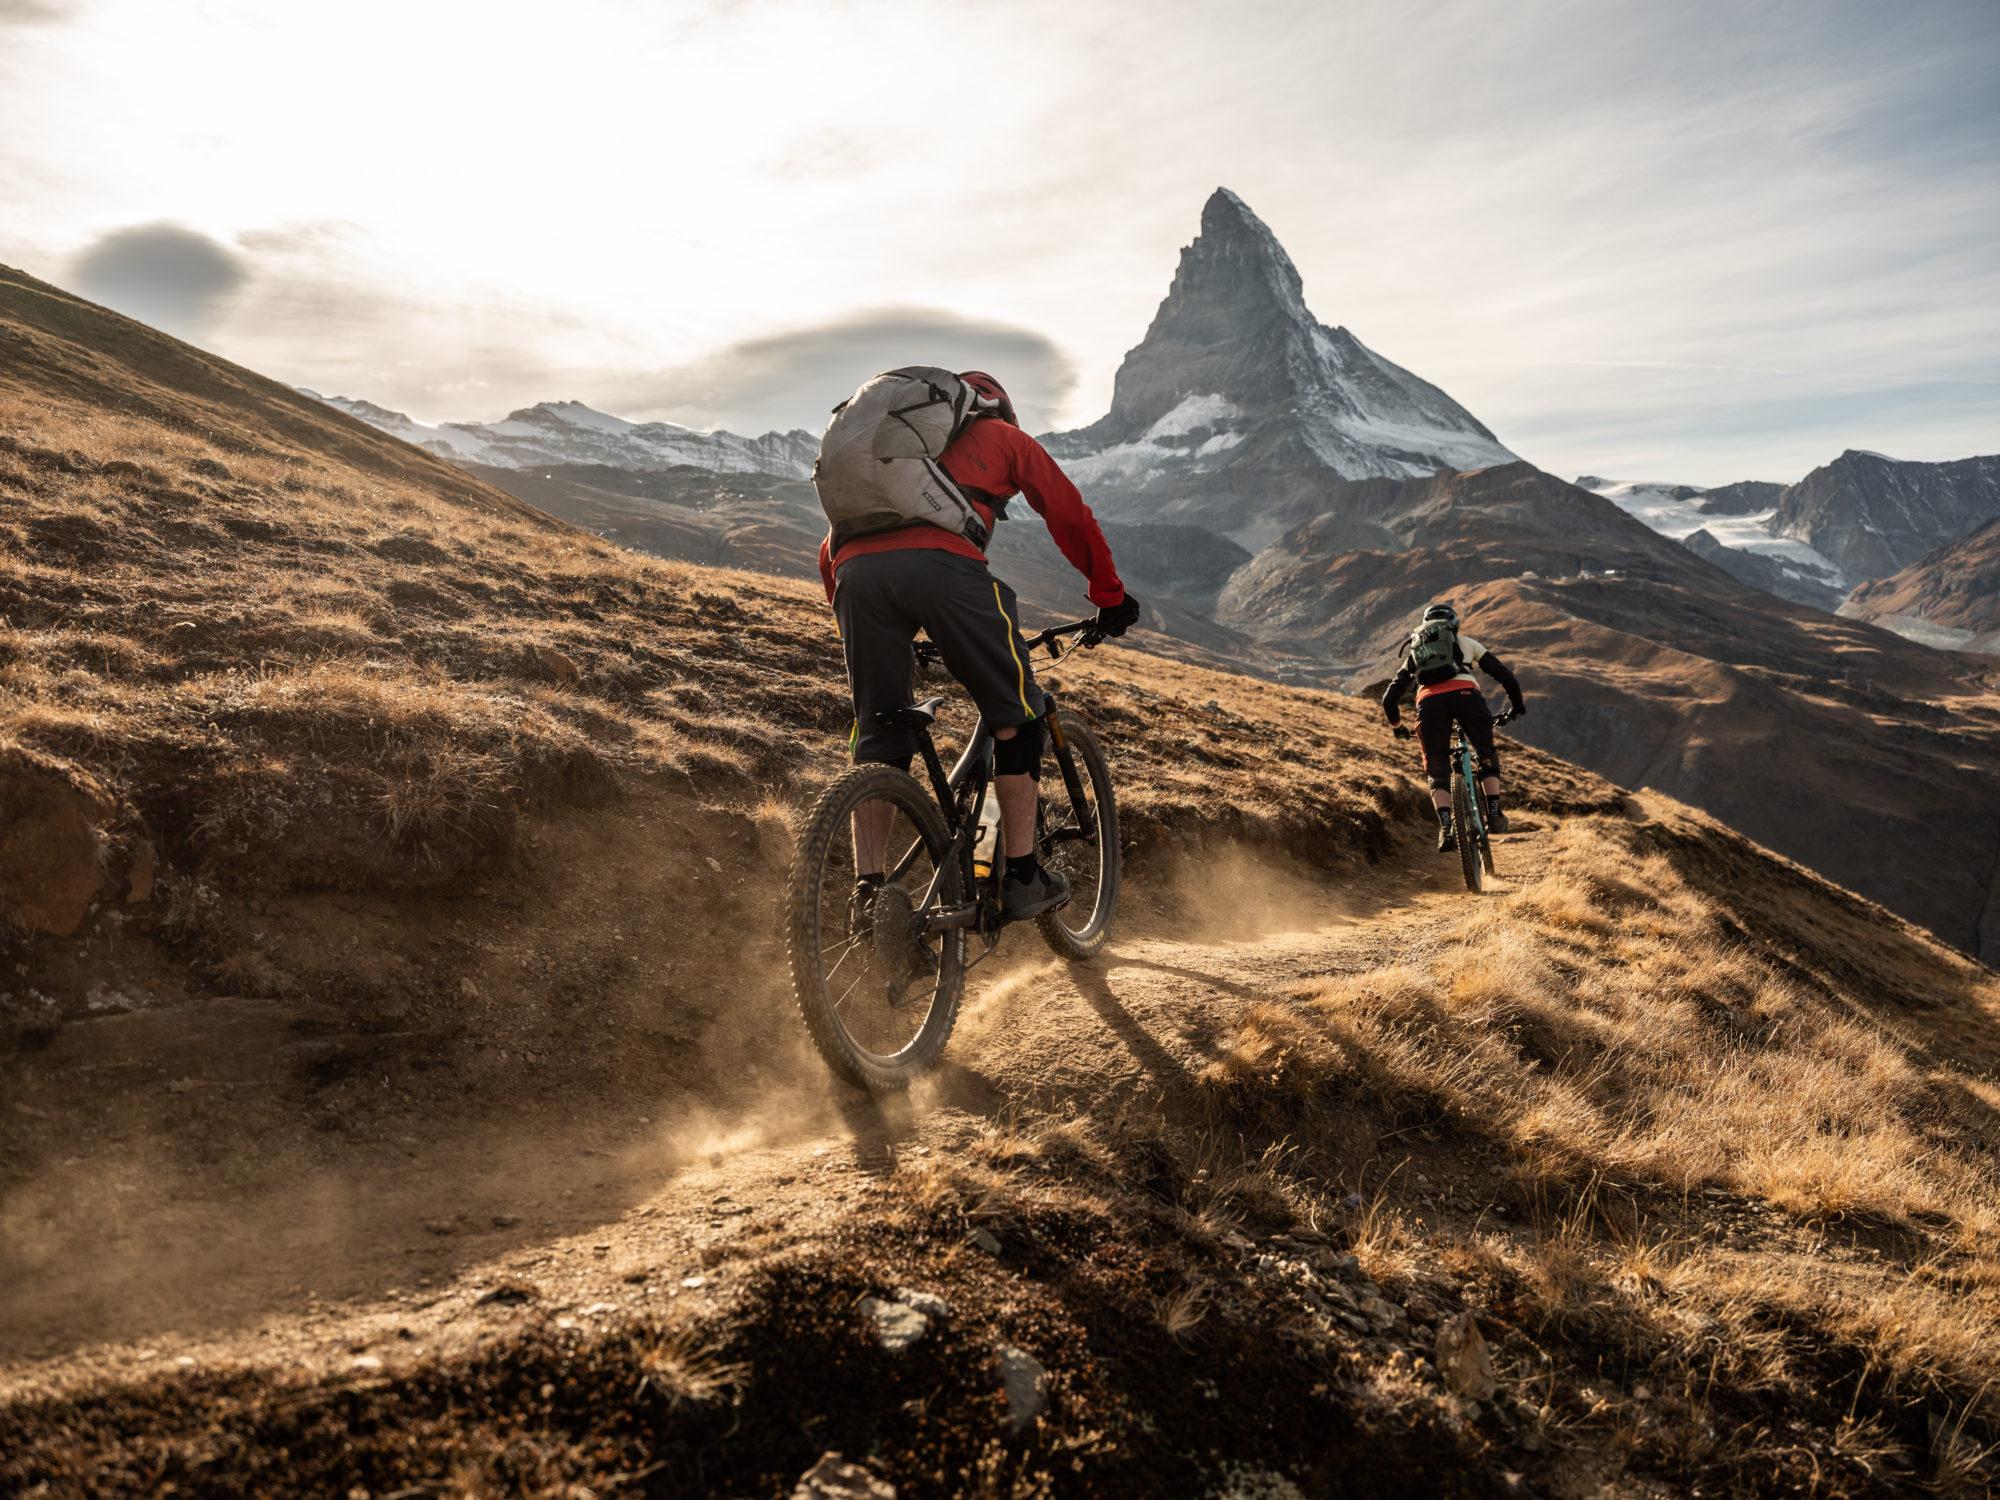 cr-Pascal-Gertschen-2018-Zermatt_2018_Bike_Herbst_HiRes_DSCF6900-2000x1500.jpg